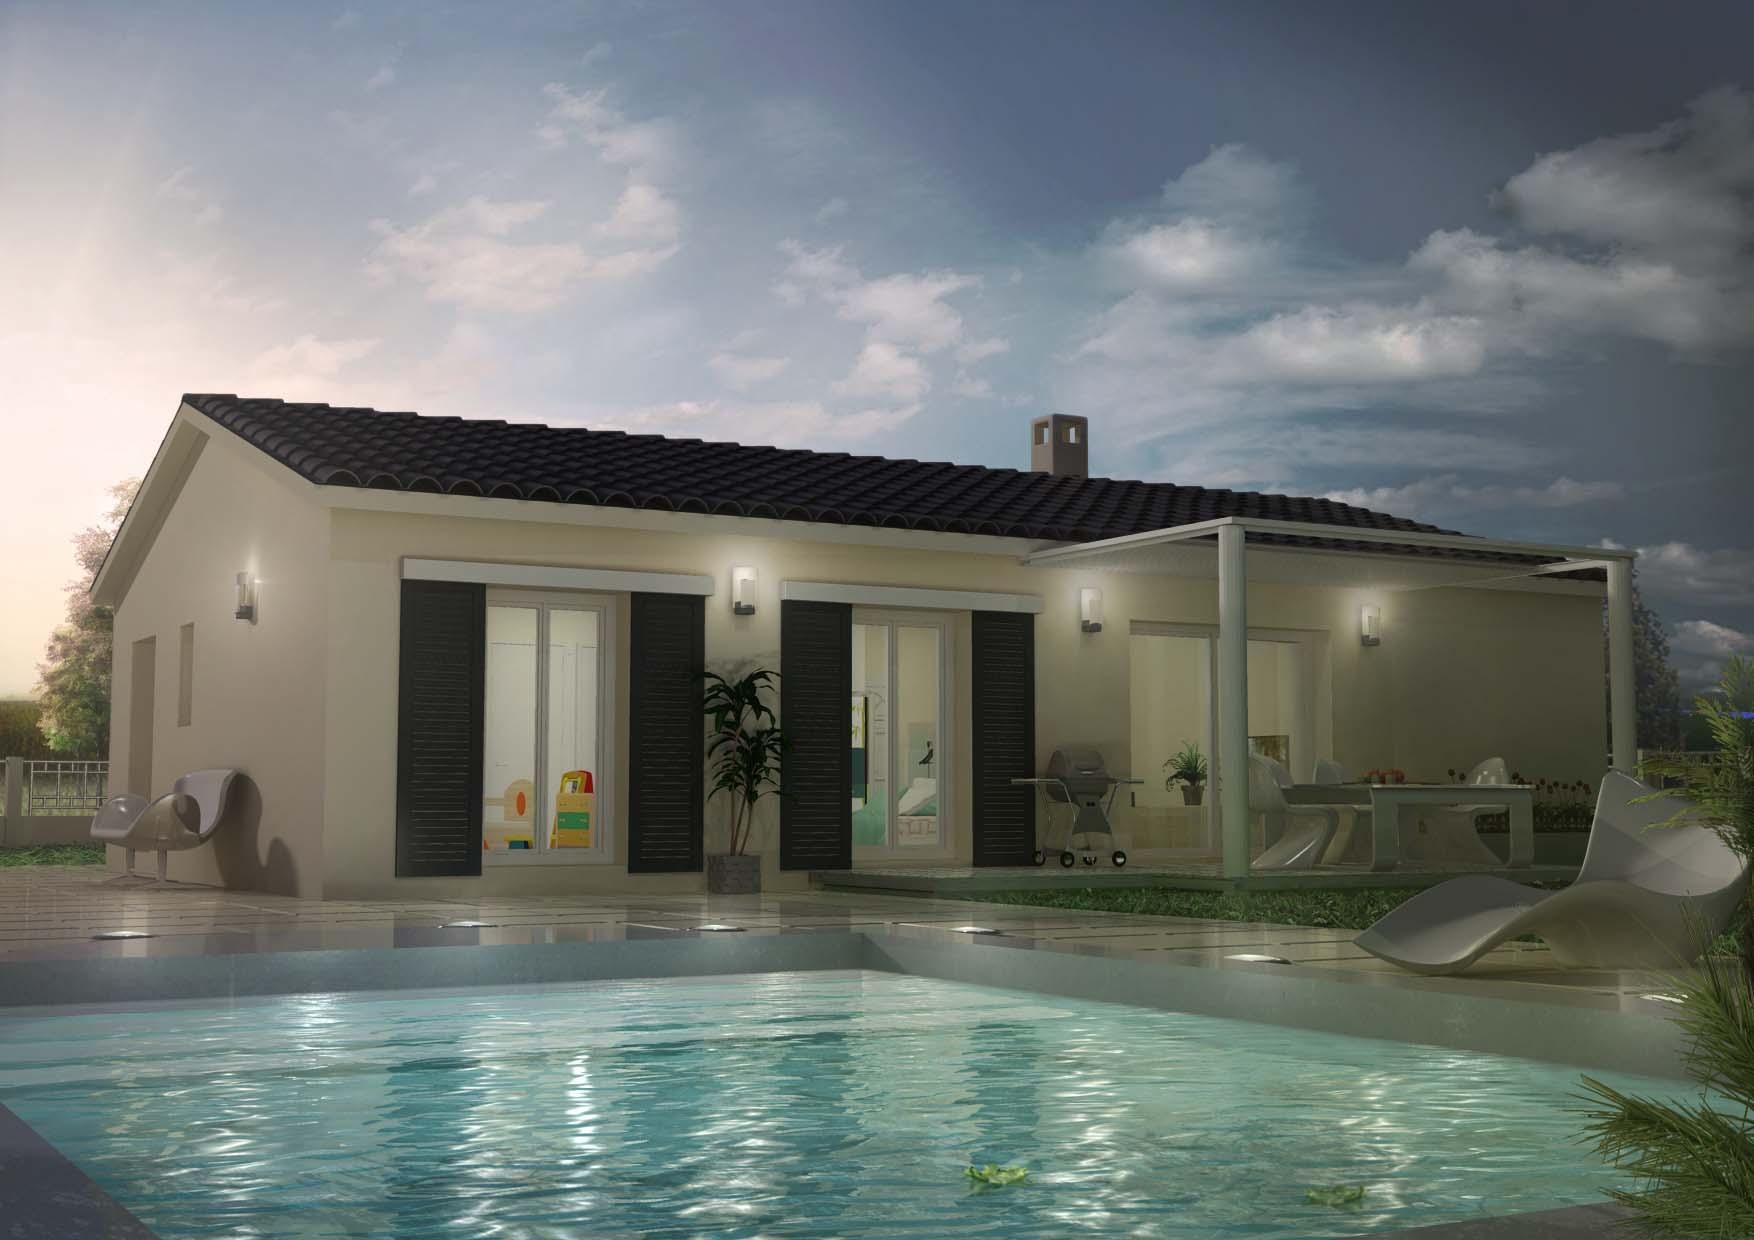 maison printanes free cheap maison de repos with maison de repos with maison printanes latest. Black Bedroom Furniture Sets. Home Design Ideas